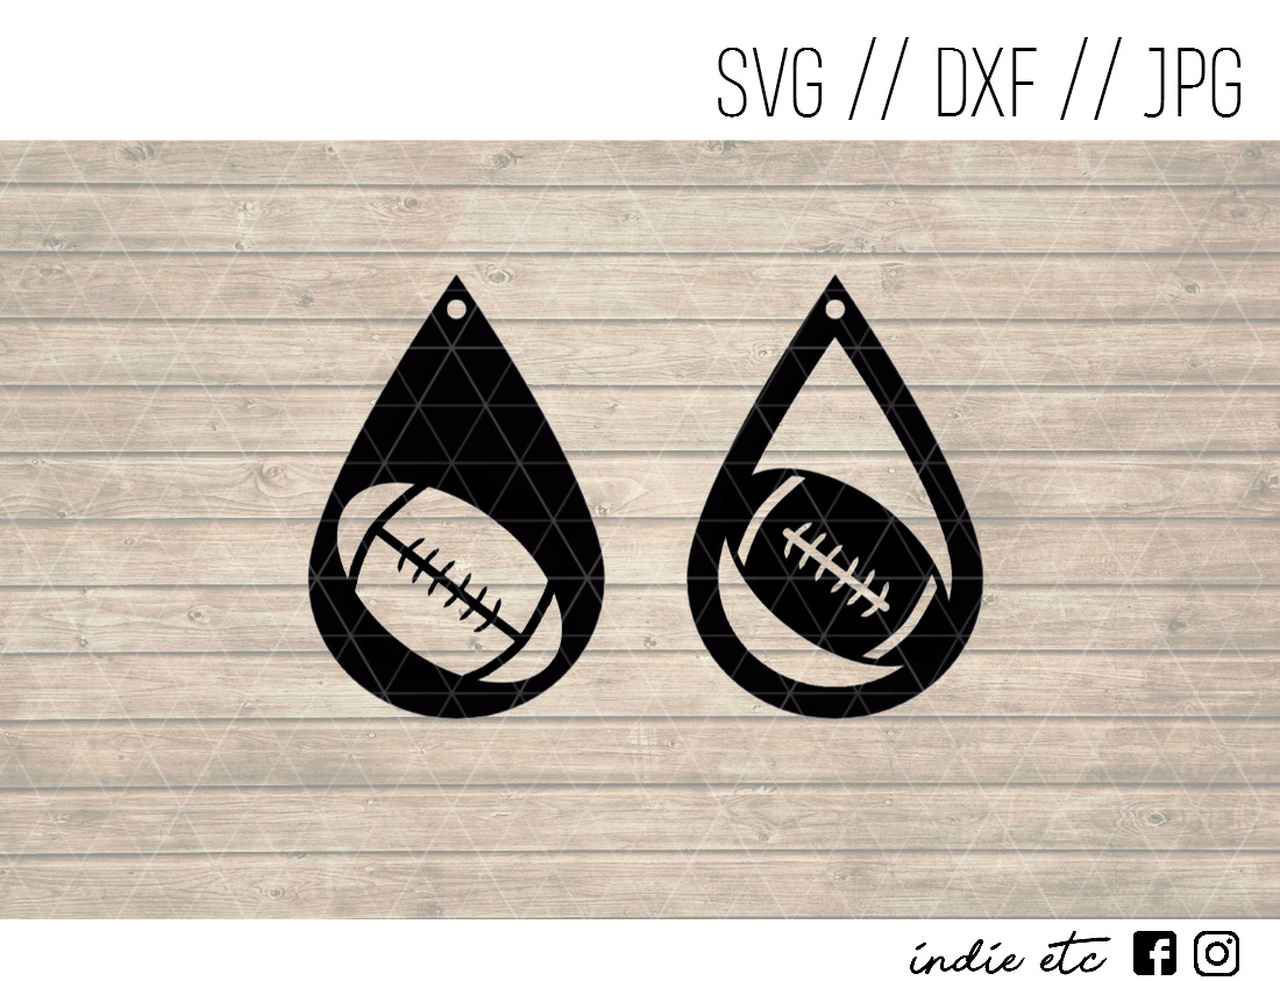 teardrop earring svg #623, Download drawings